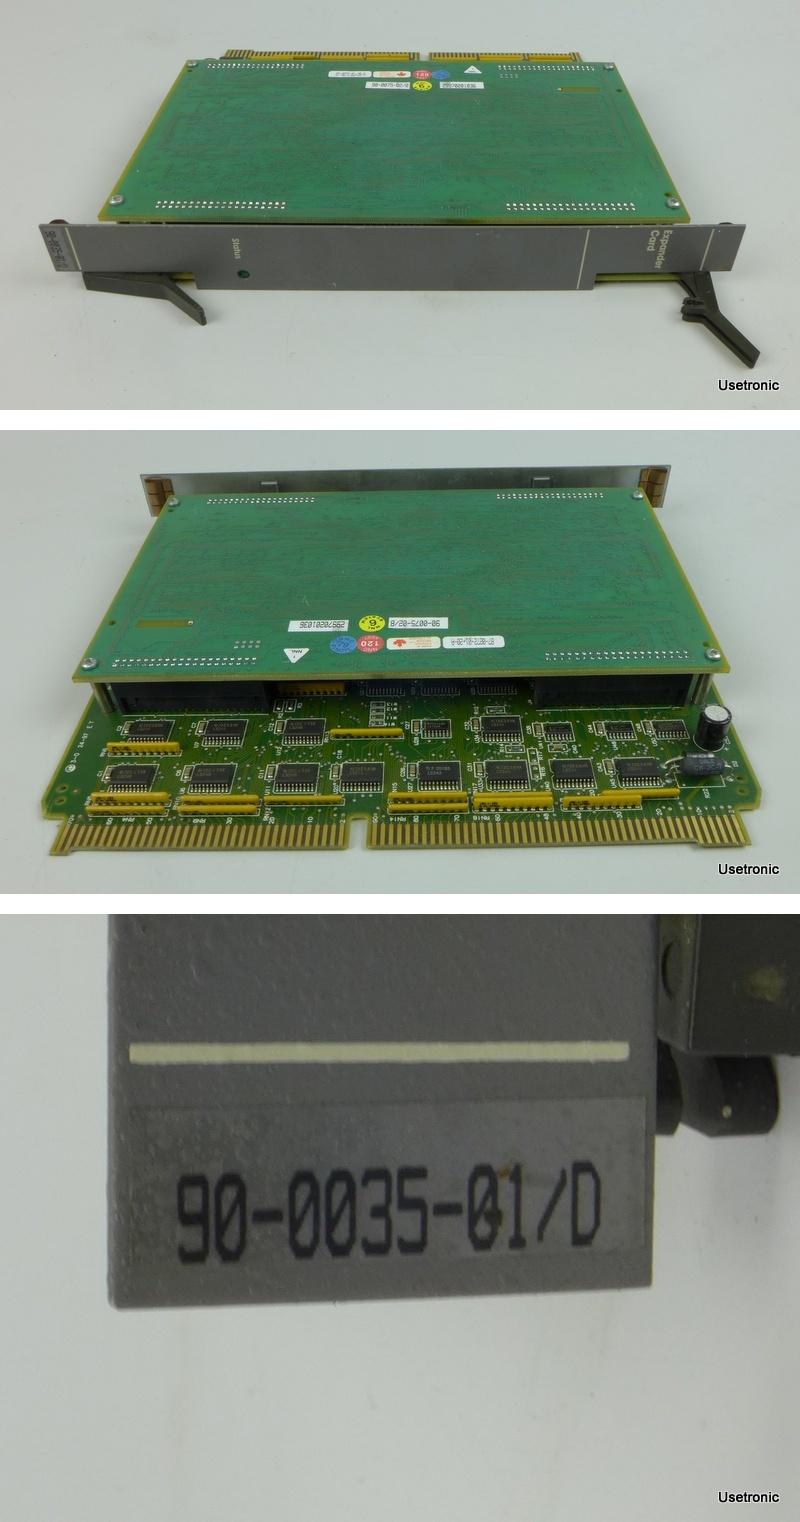 Alcatel Lucent card 90-0035-01